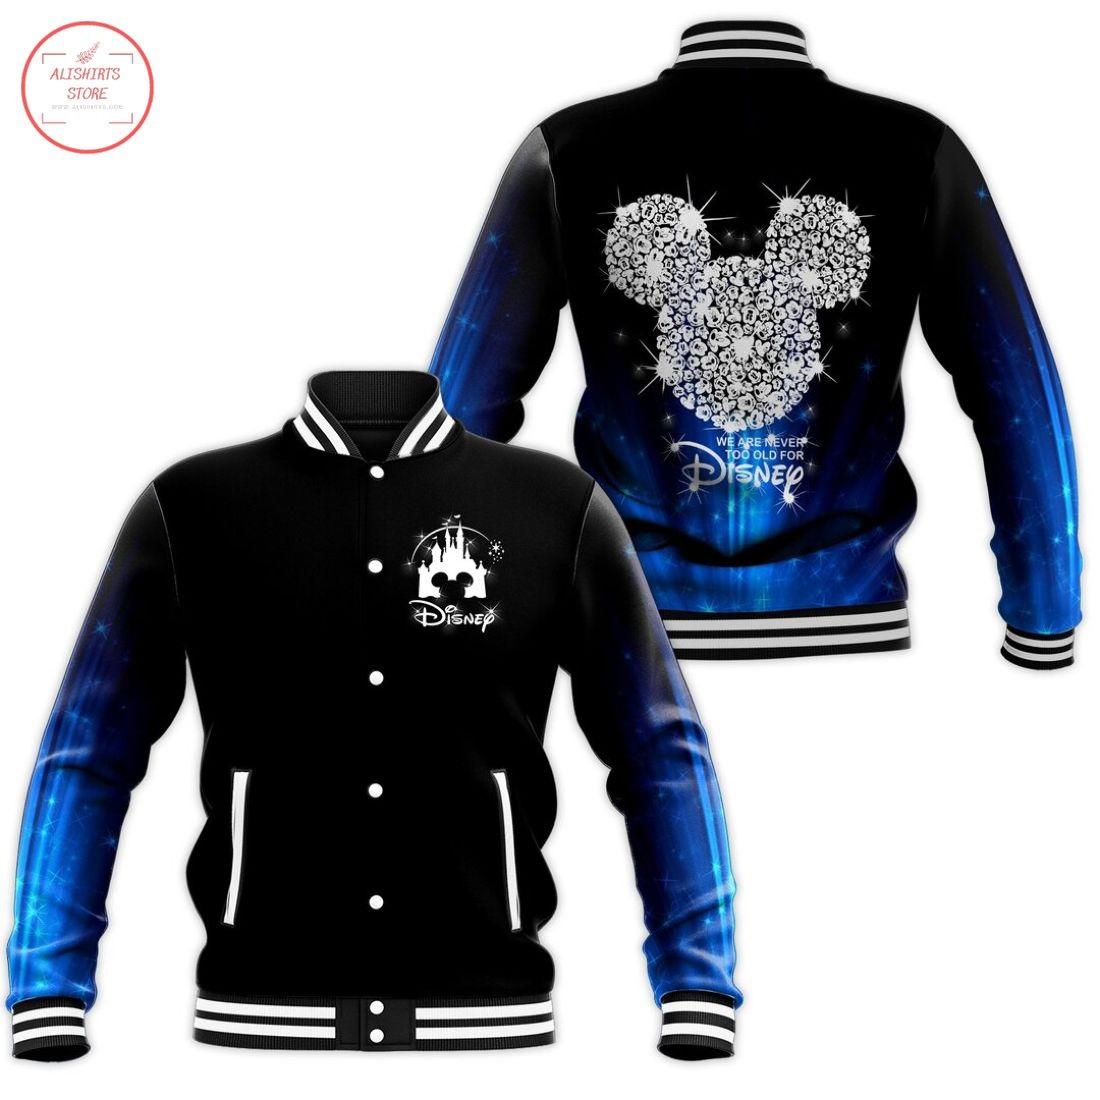 Diamond Mickey Disney Letterman Jacket